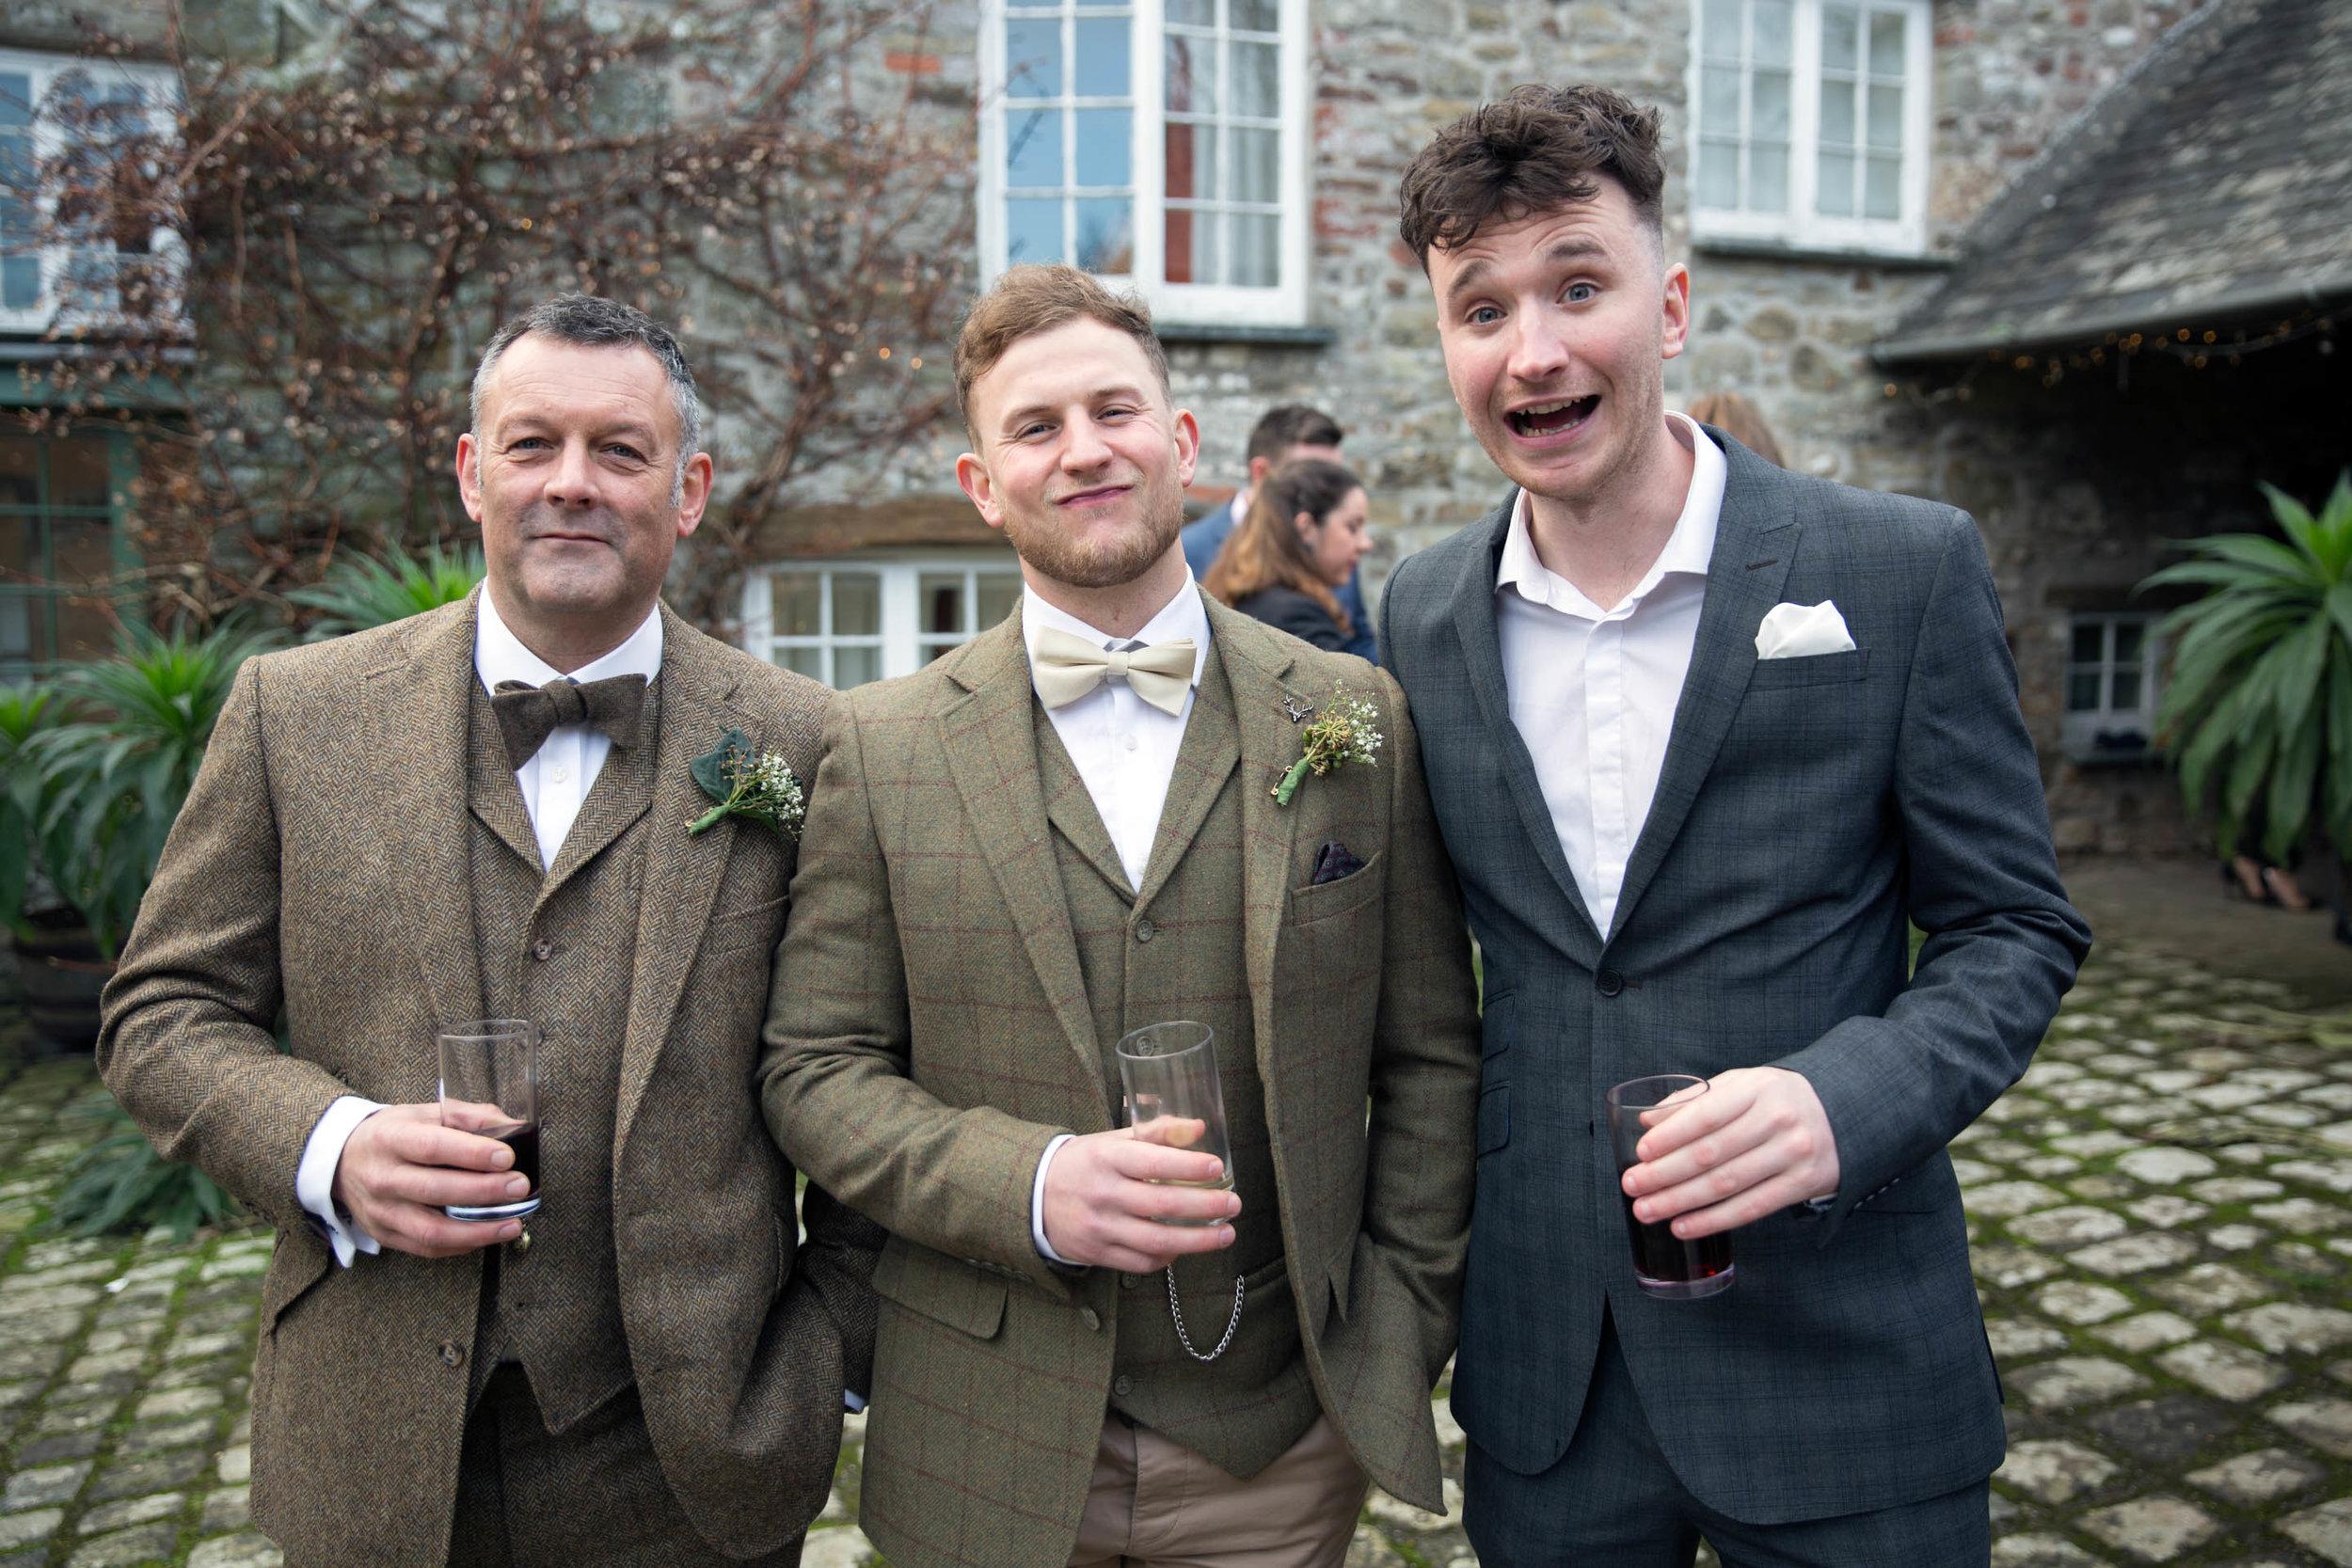 Jess & Ben - Bristol Wedding Photographer - Wright Wedding Photography - 92